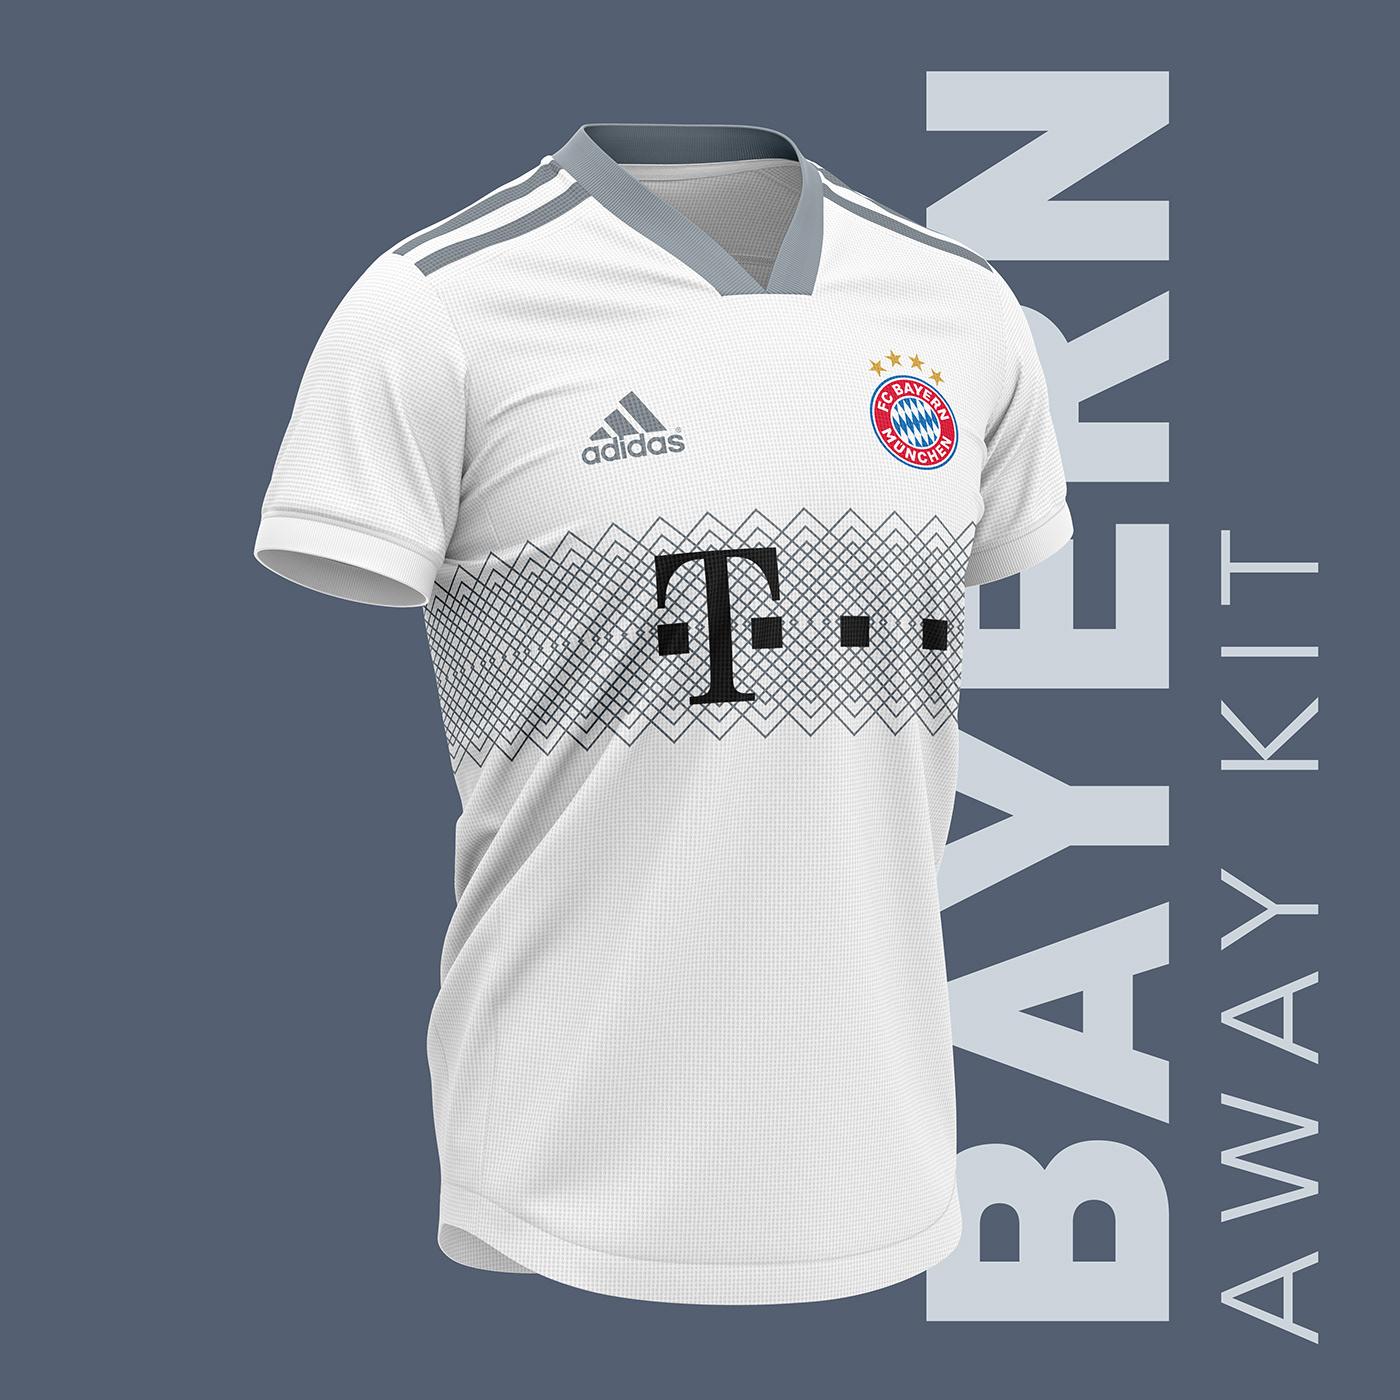 Bayern,München,germany,bundes liga,adidas,soccer,football,kit